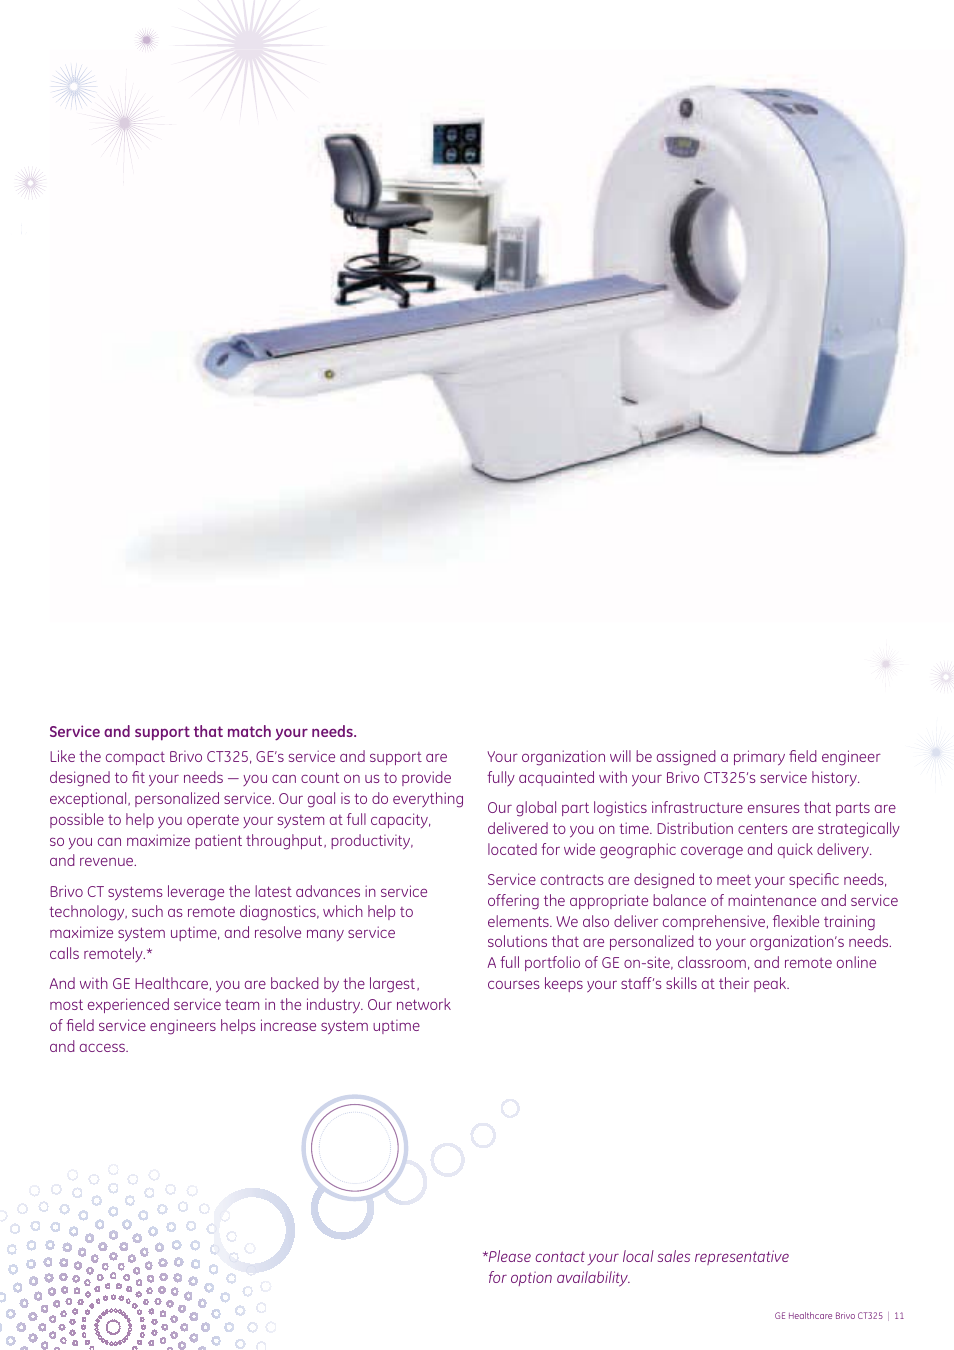 ge healthcare brivo ct325 user manual page 11 12 rh manualsdir com Old Sewing Machine Manuals Old Sewing Machine Manuals